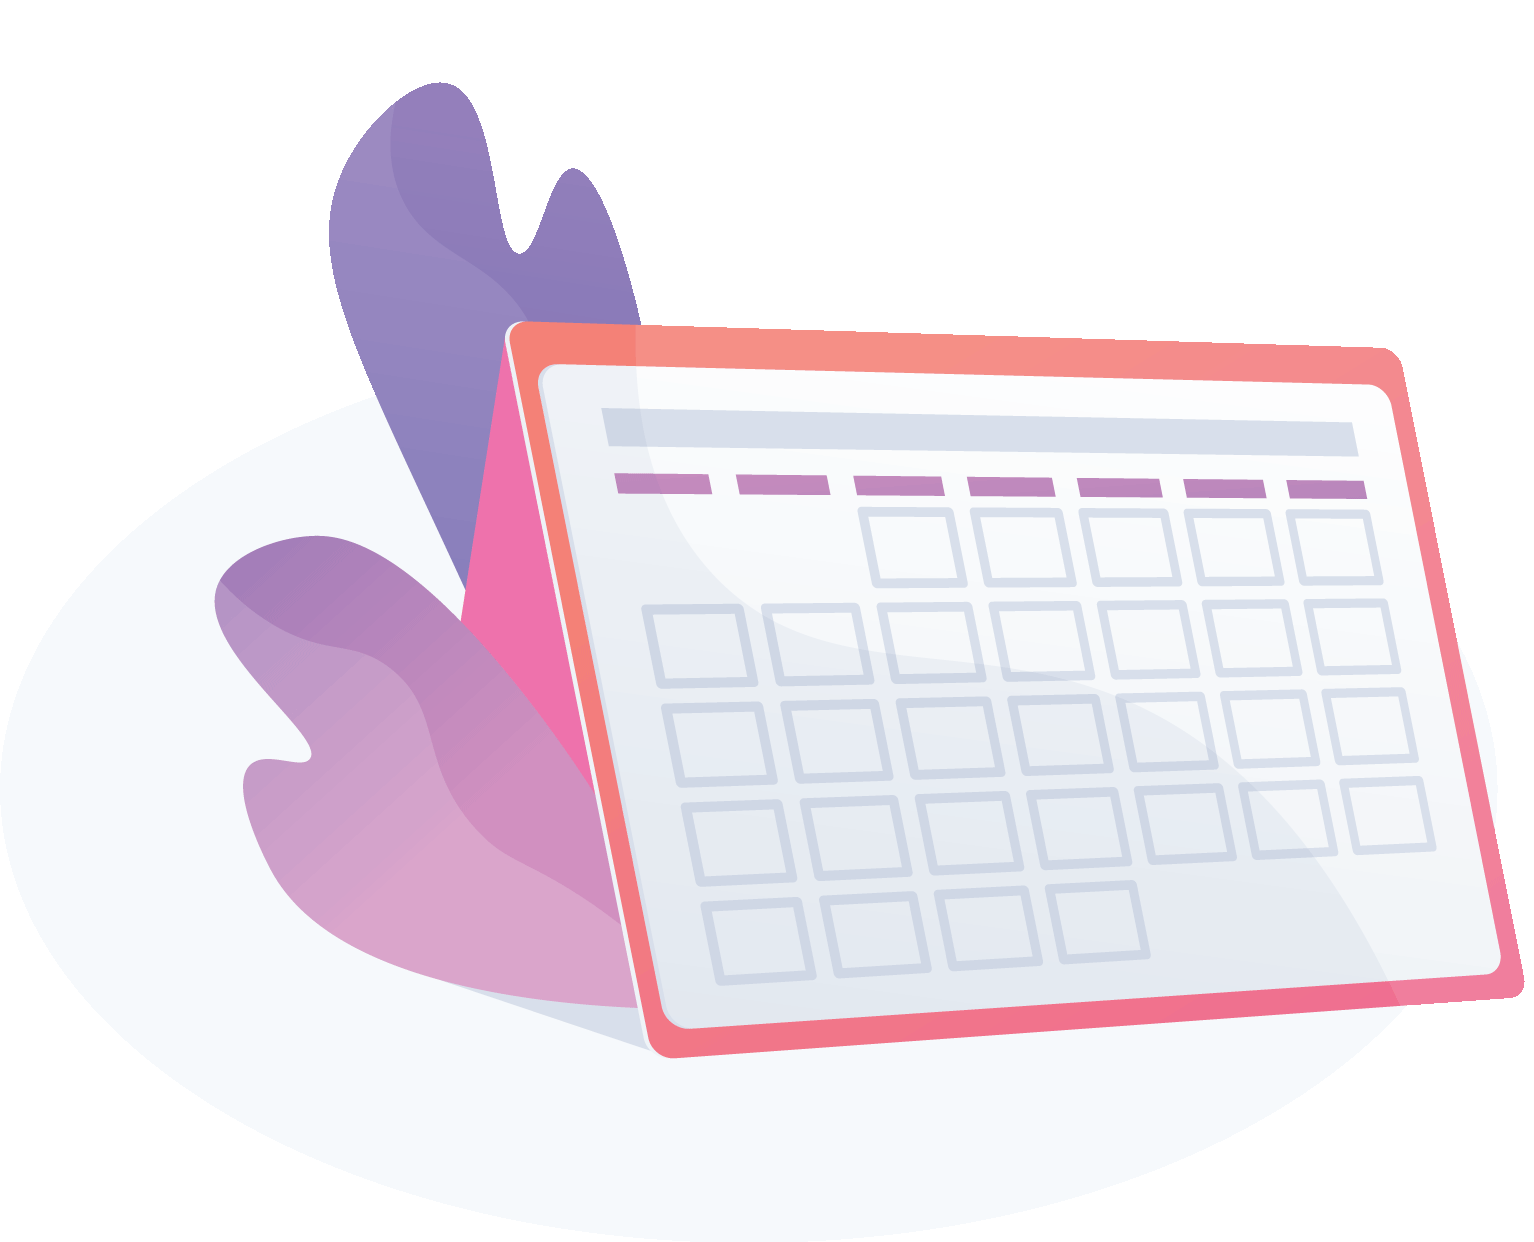 illustration of a calendar